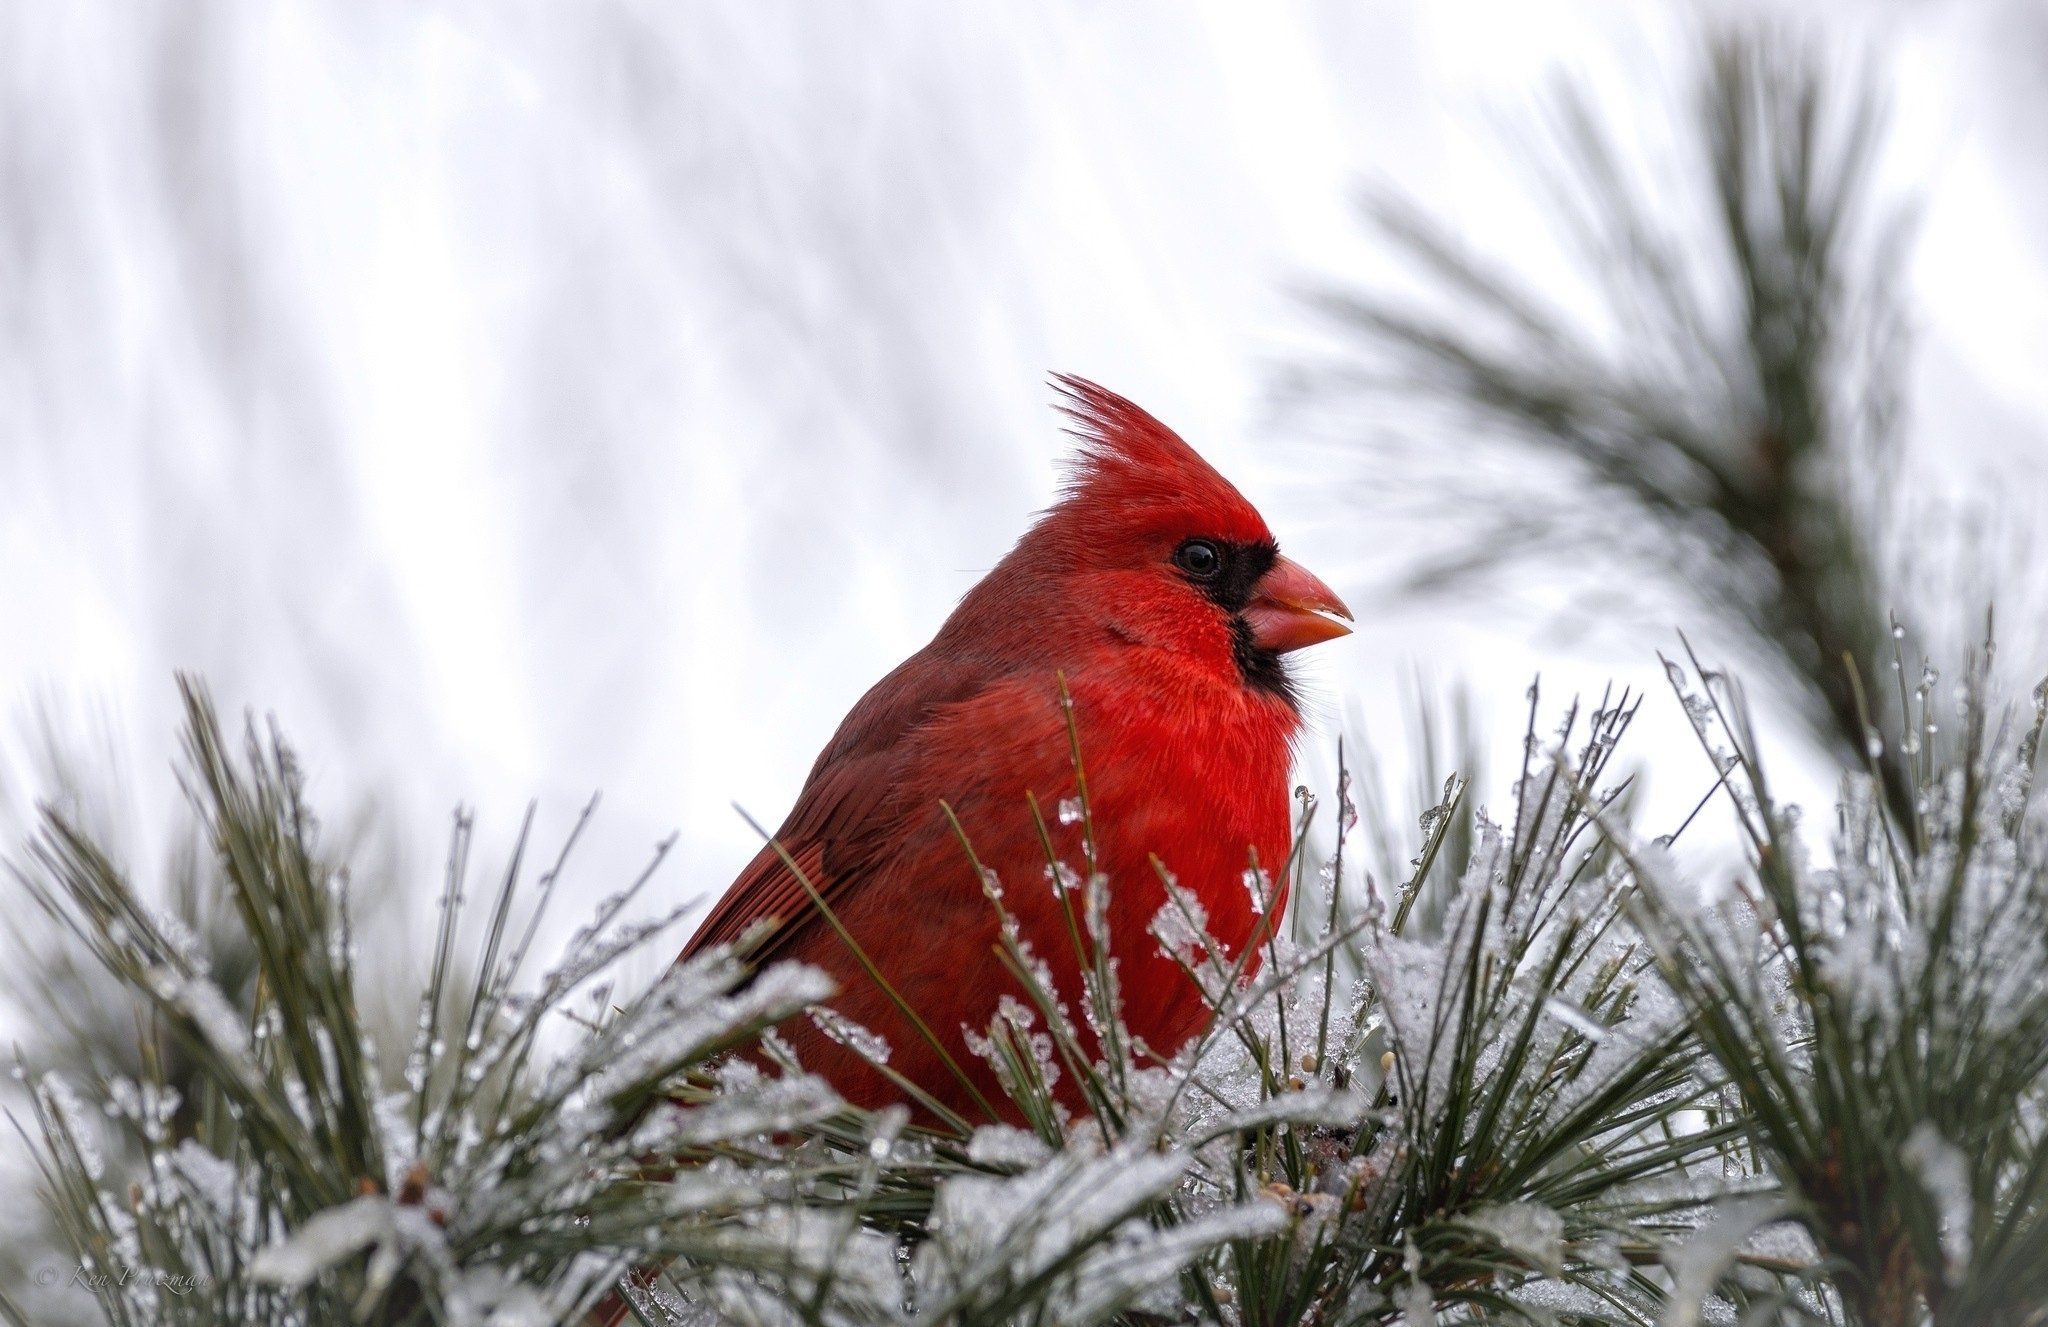 cardinal birds in snow wallpaper (47+ images)